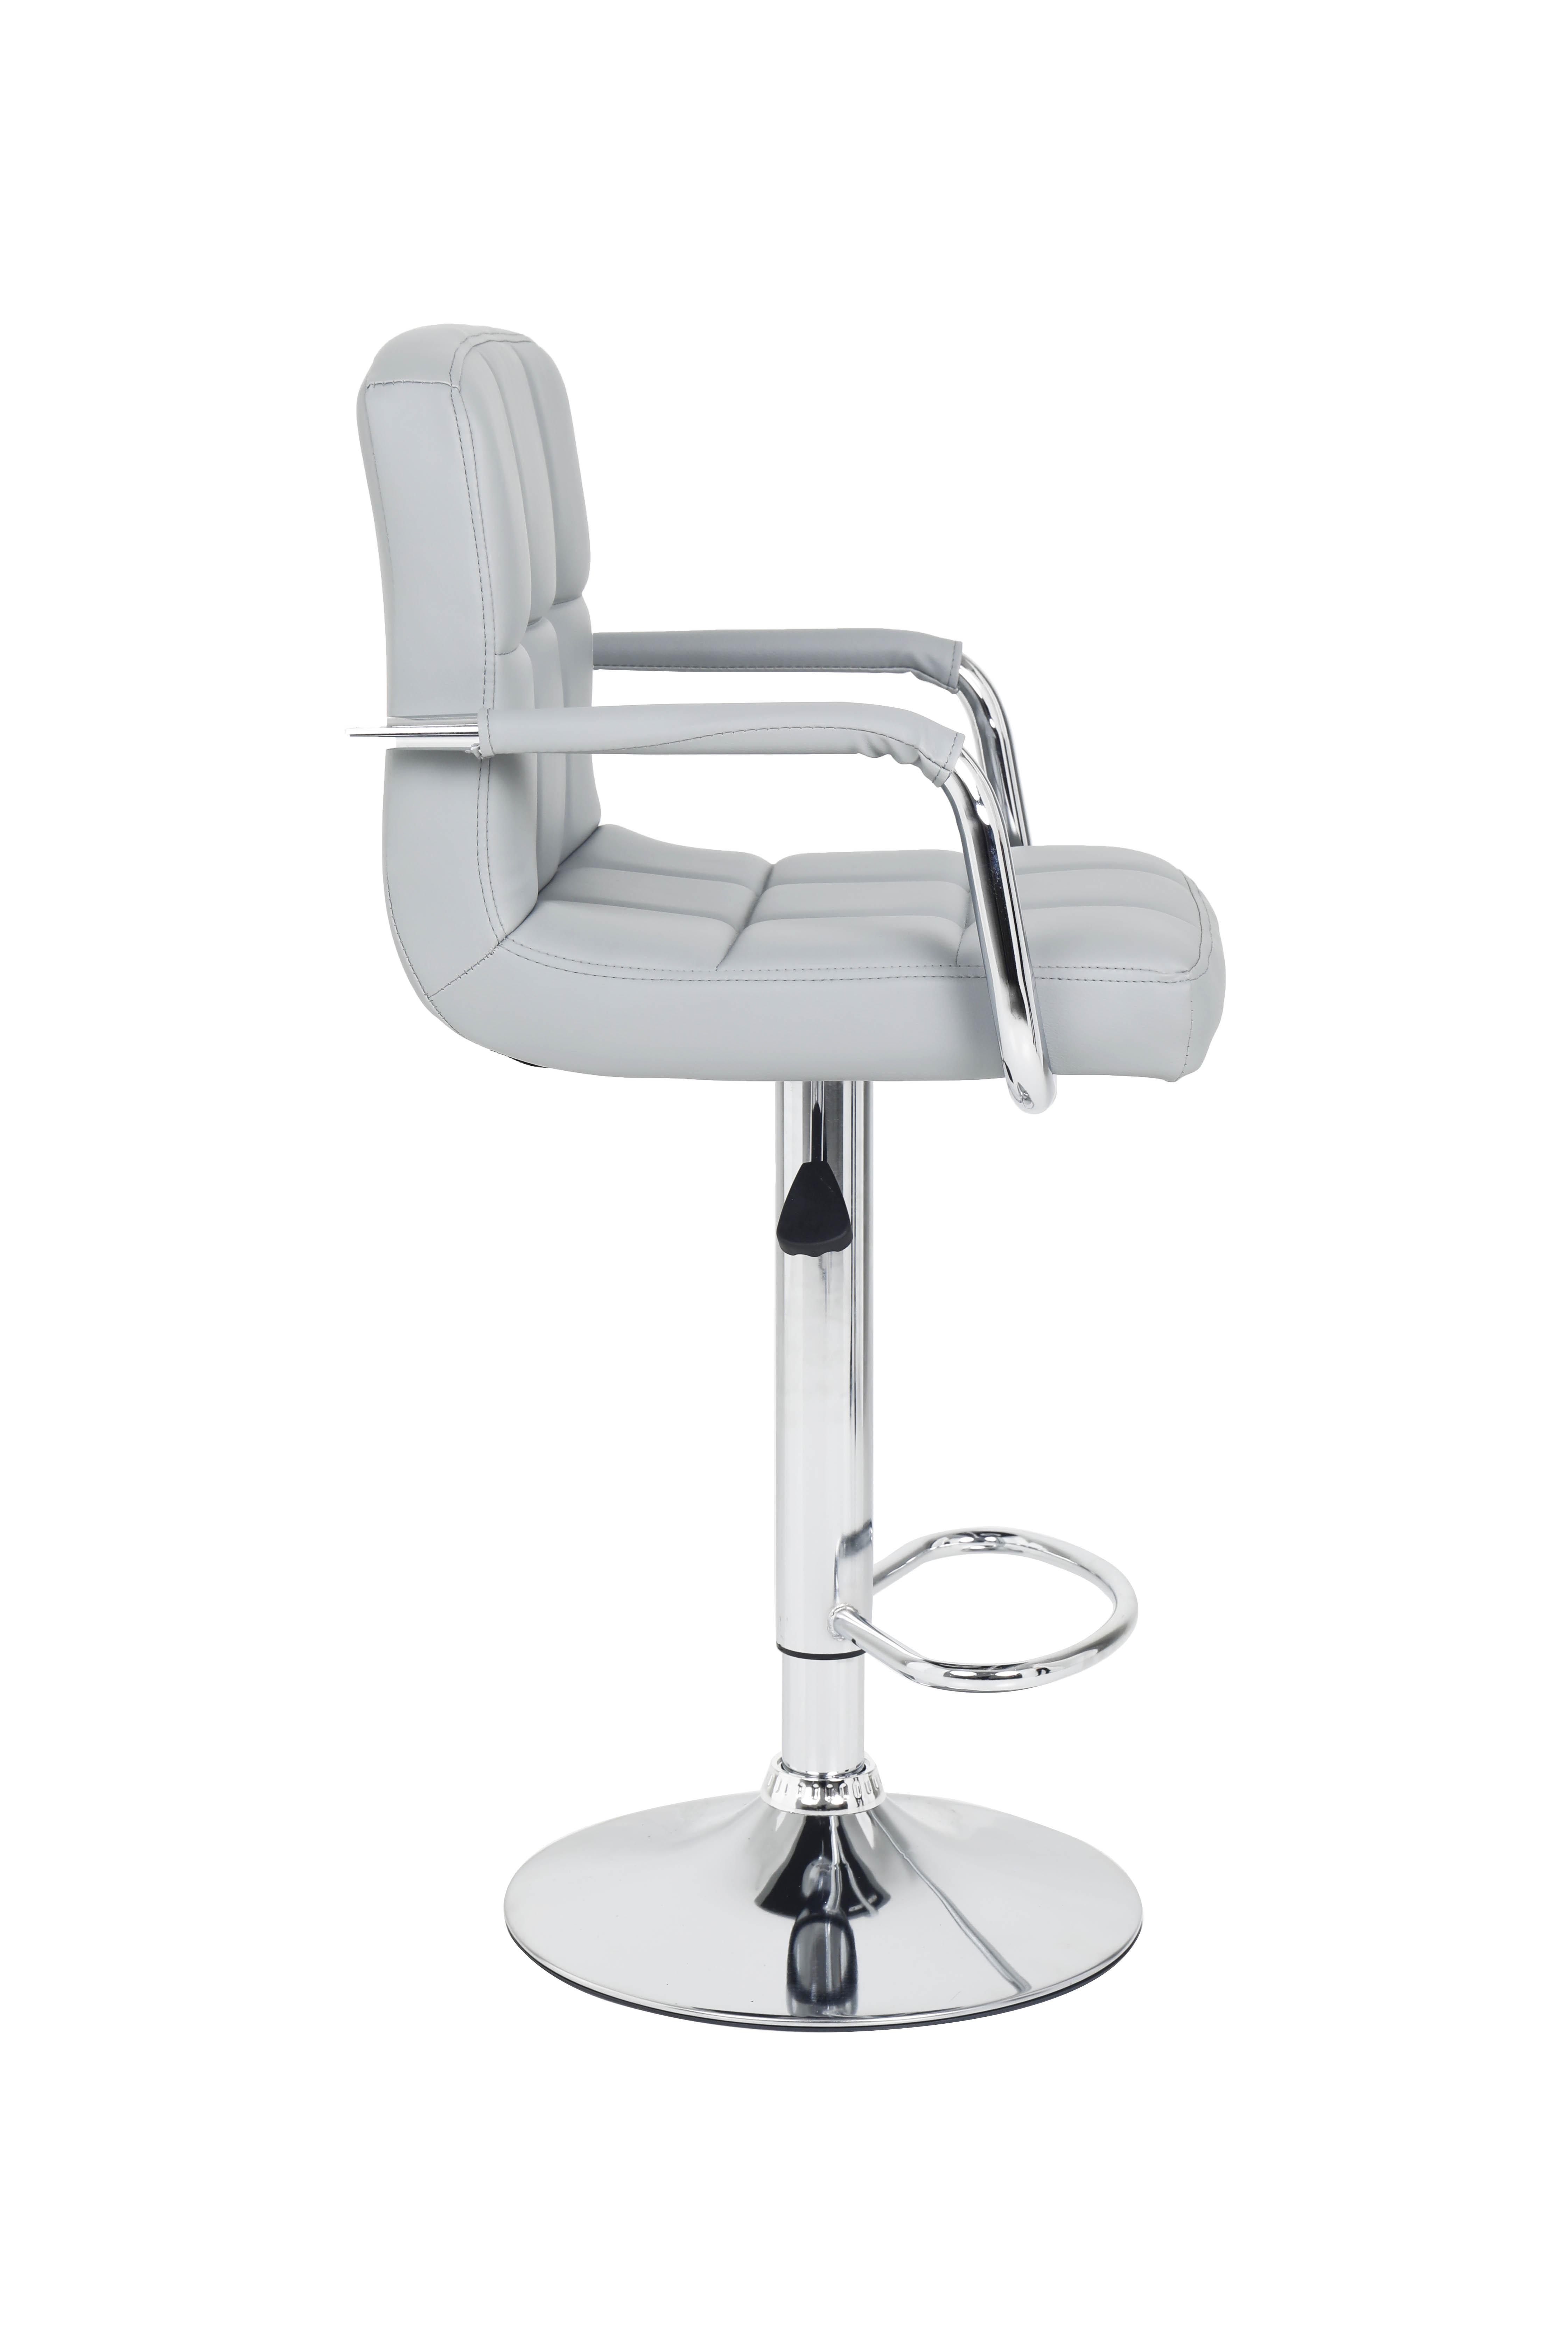 2 x Miami Style PU Leather Breakfast Lounge Bar Kitchen Pub Swivel Chairs Stools Grey